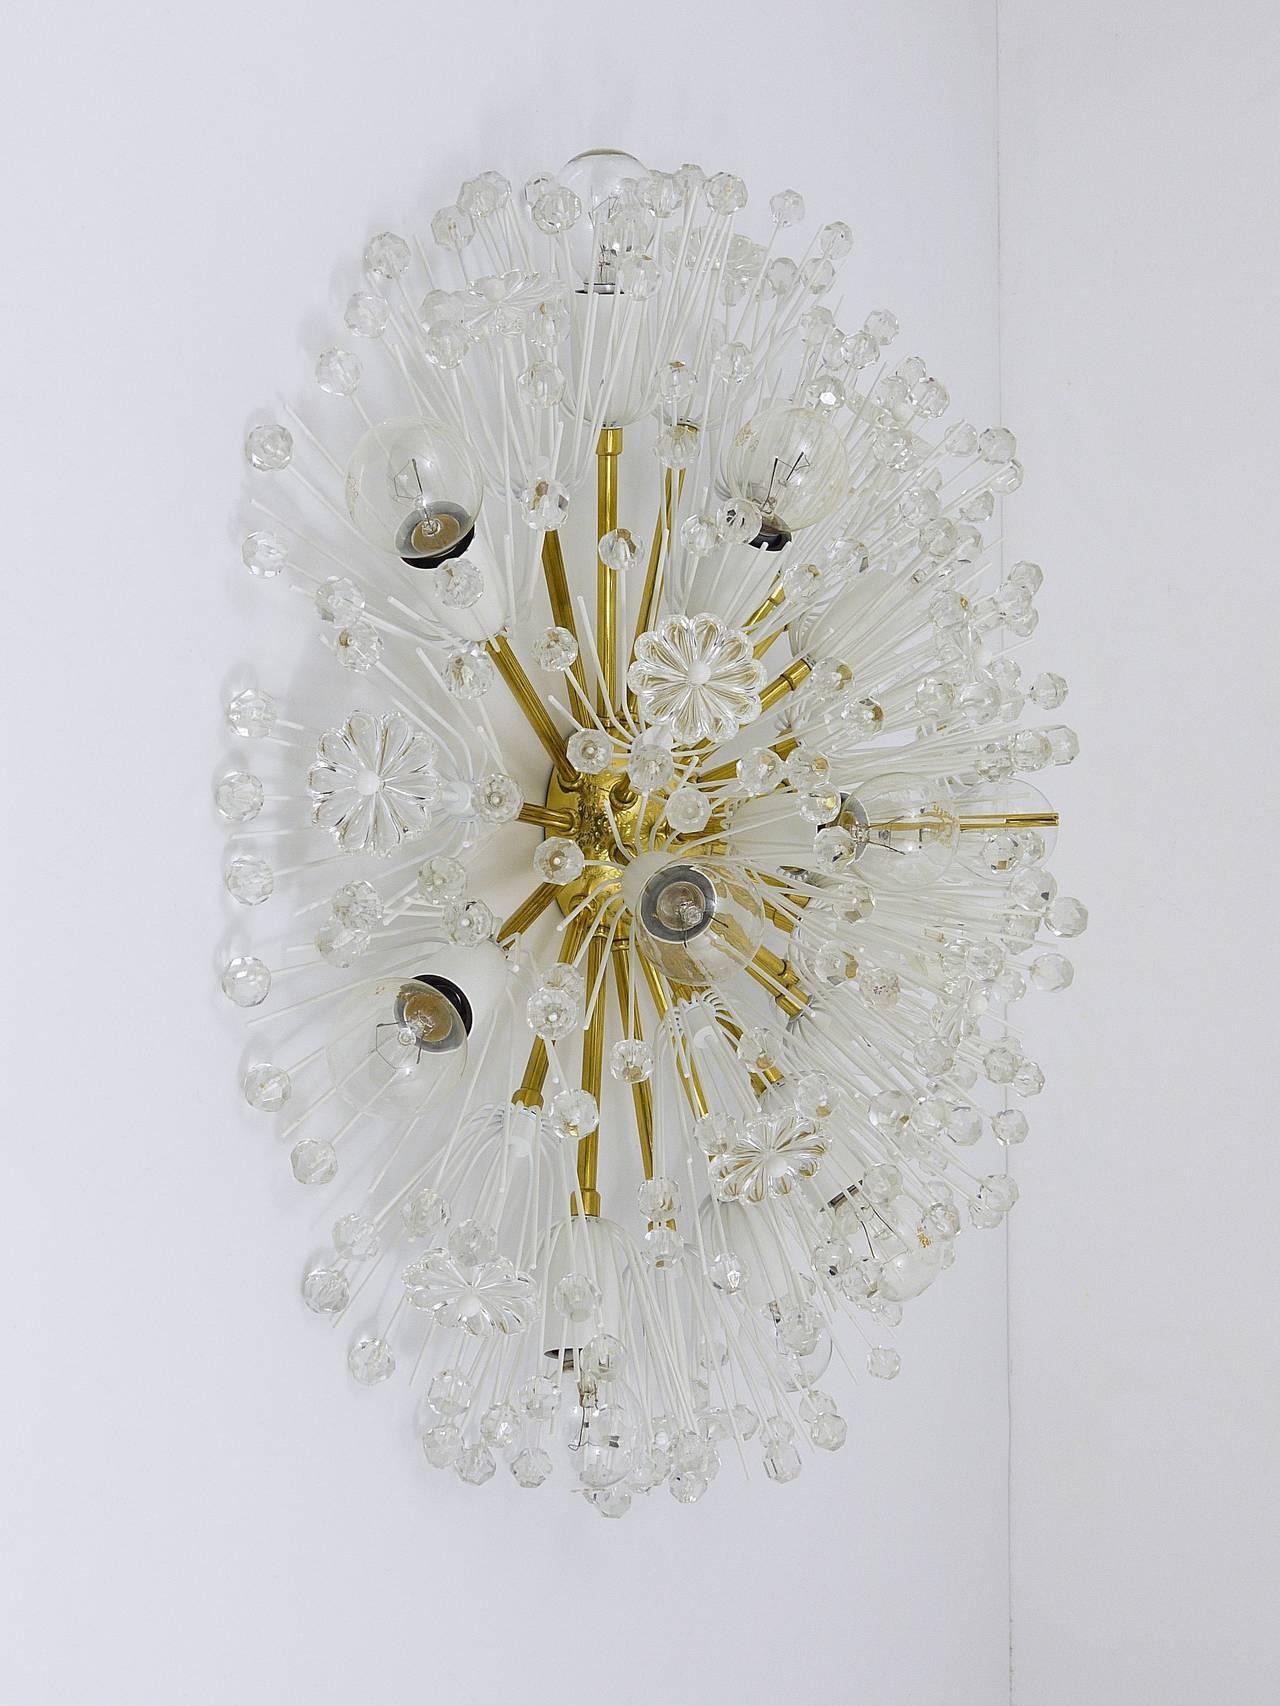 20th Century Austrian Emil Stejnar Brass Crystal Flush Mount or Sconce, Rupert Nikoll, 1950s For Sale